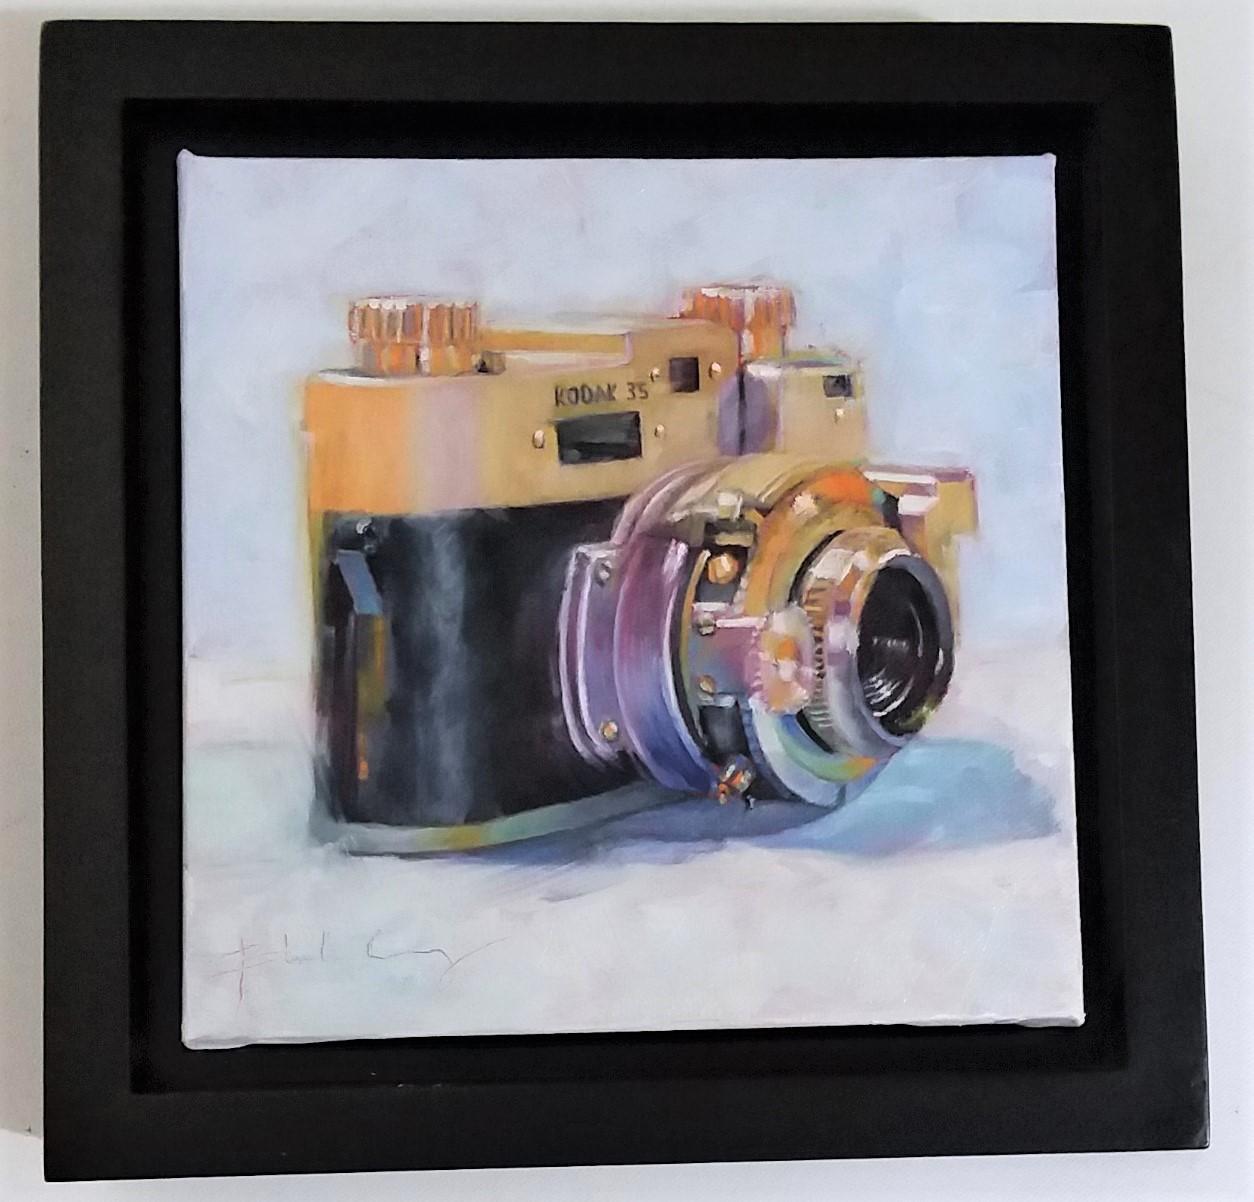 A framed oil painting of a Kodak camera